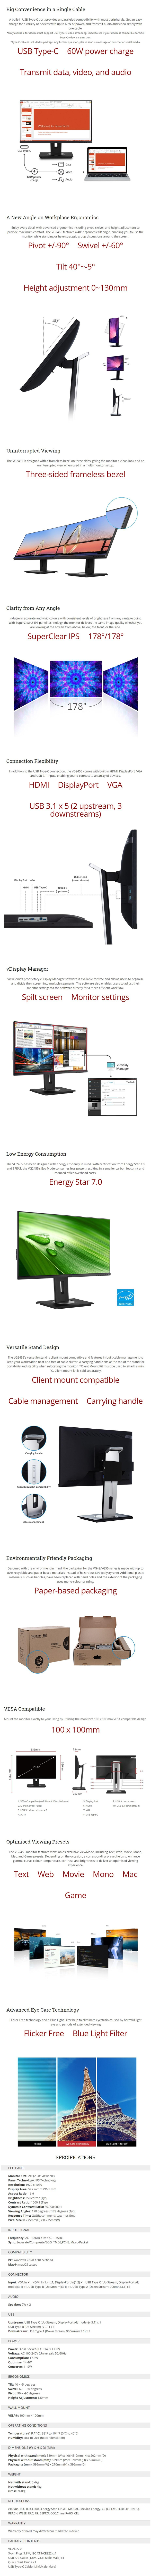 viewsonic-vg2455-24-full-hd-ips-lcd-monitor-ac28831.jpg